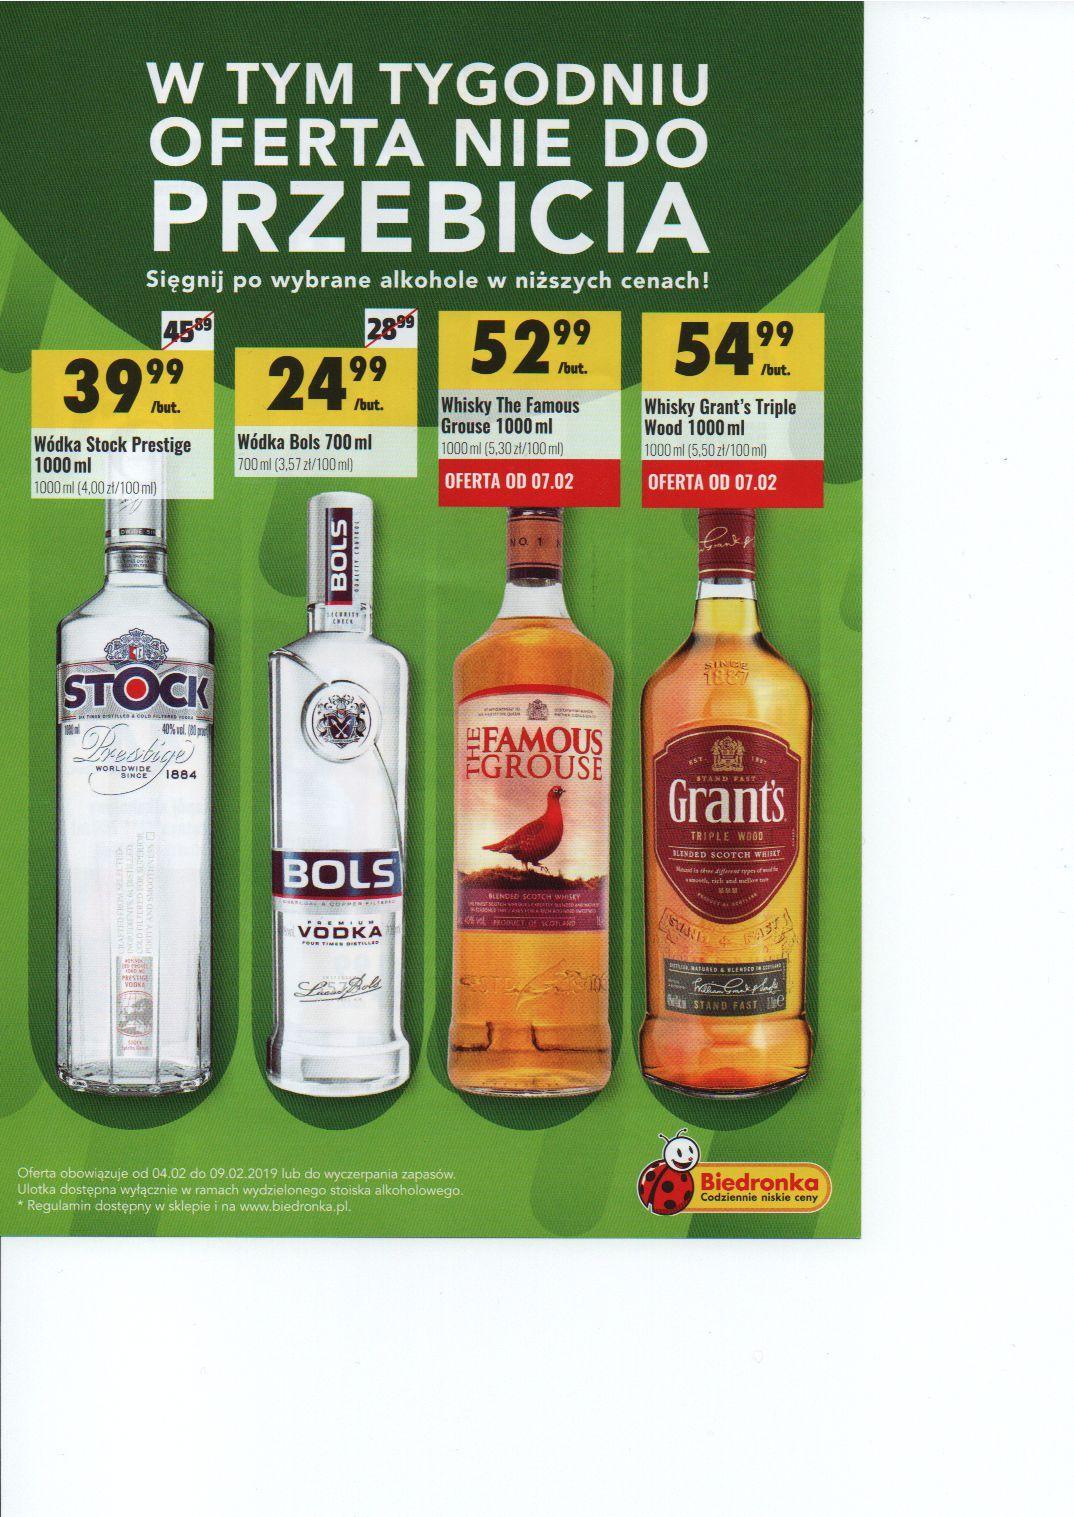 Promocja na alkohol w Biedronce